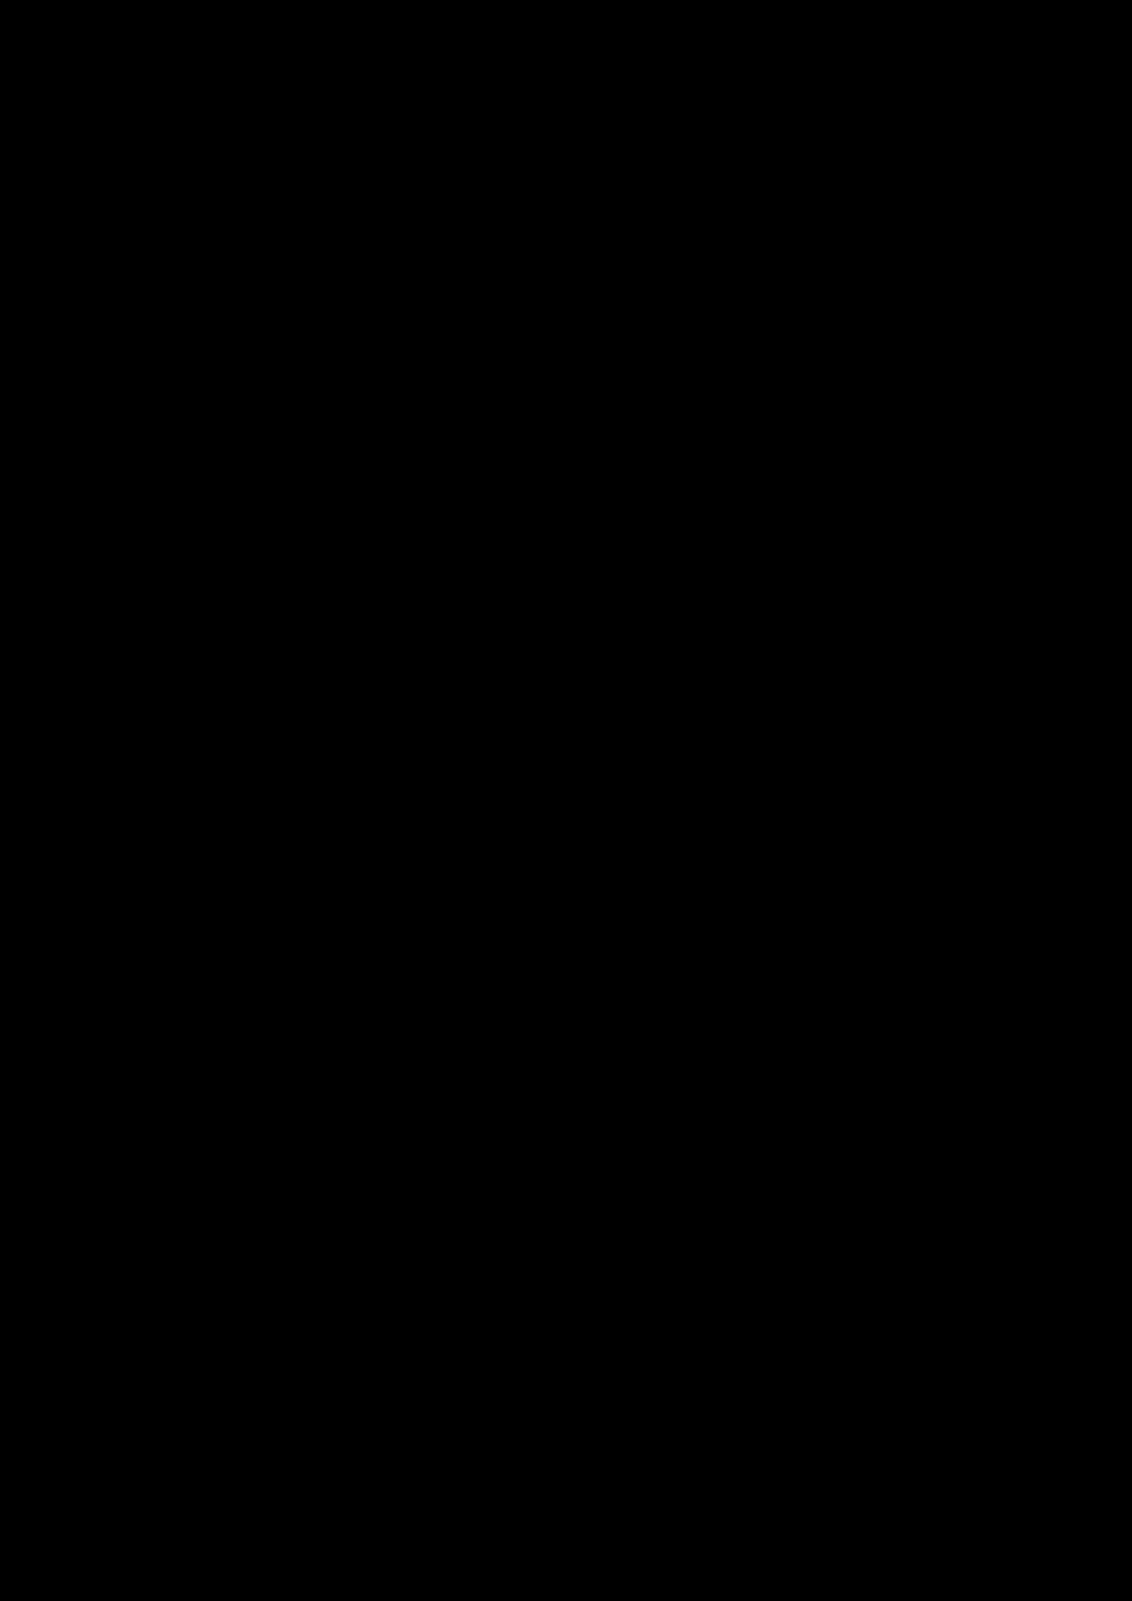 Ispoved Pervogo Boga slide, Image 70